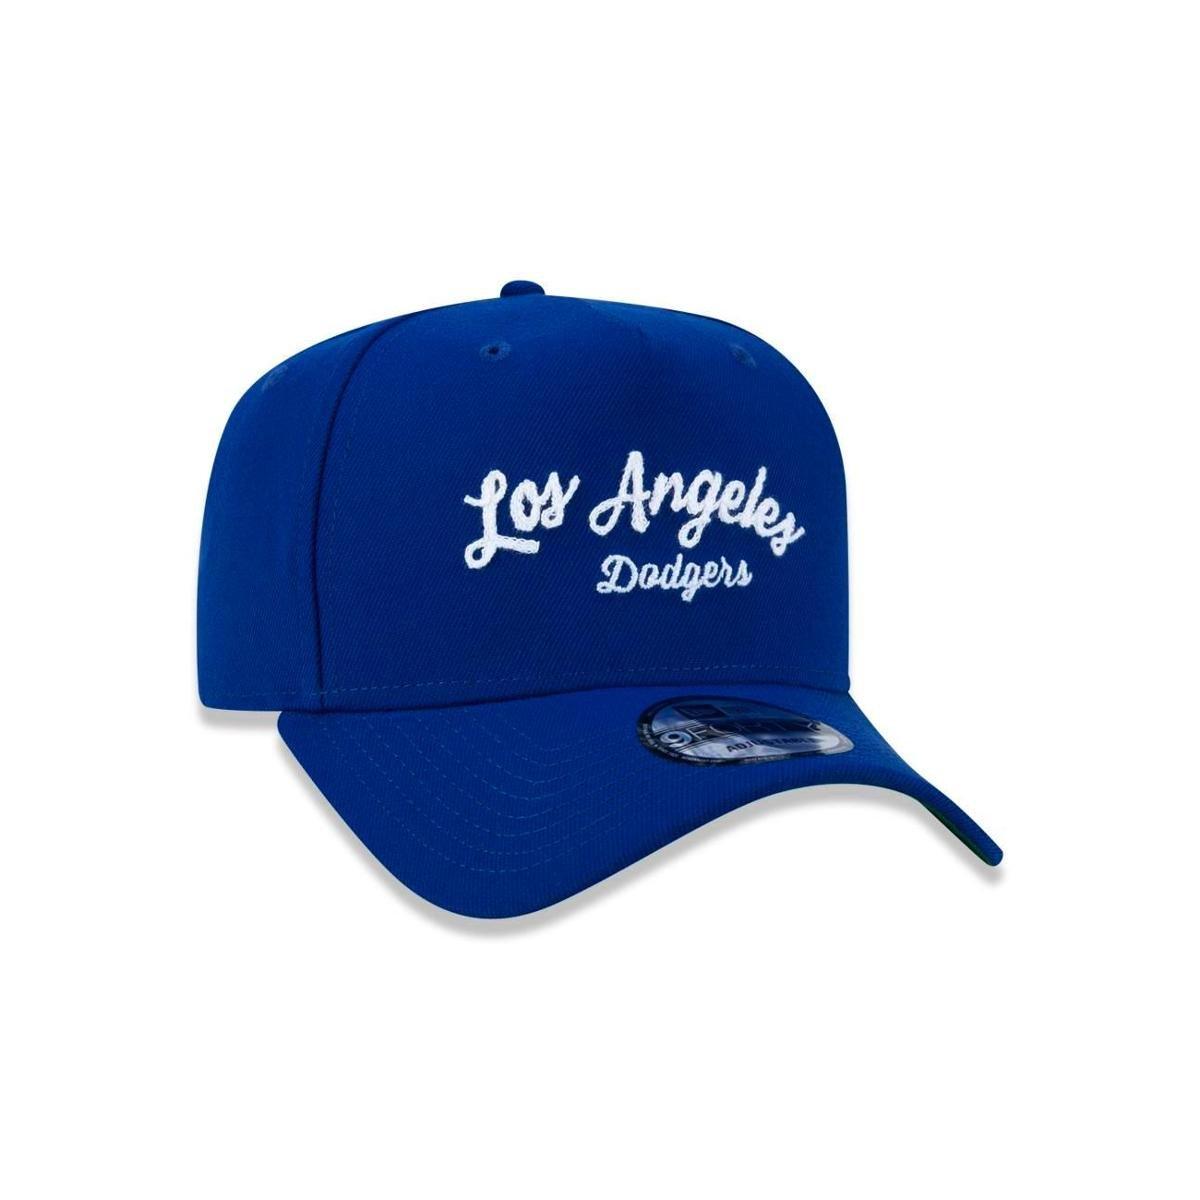 Bone 940 Los Angeles Dodgers MLB New Era - Compre Agora  74ce32d58a2